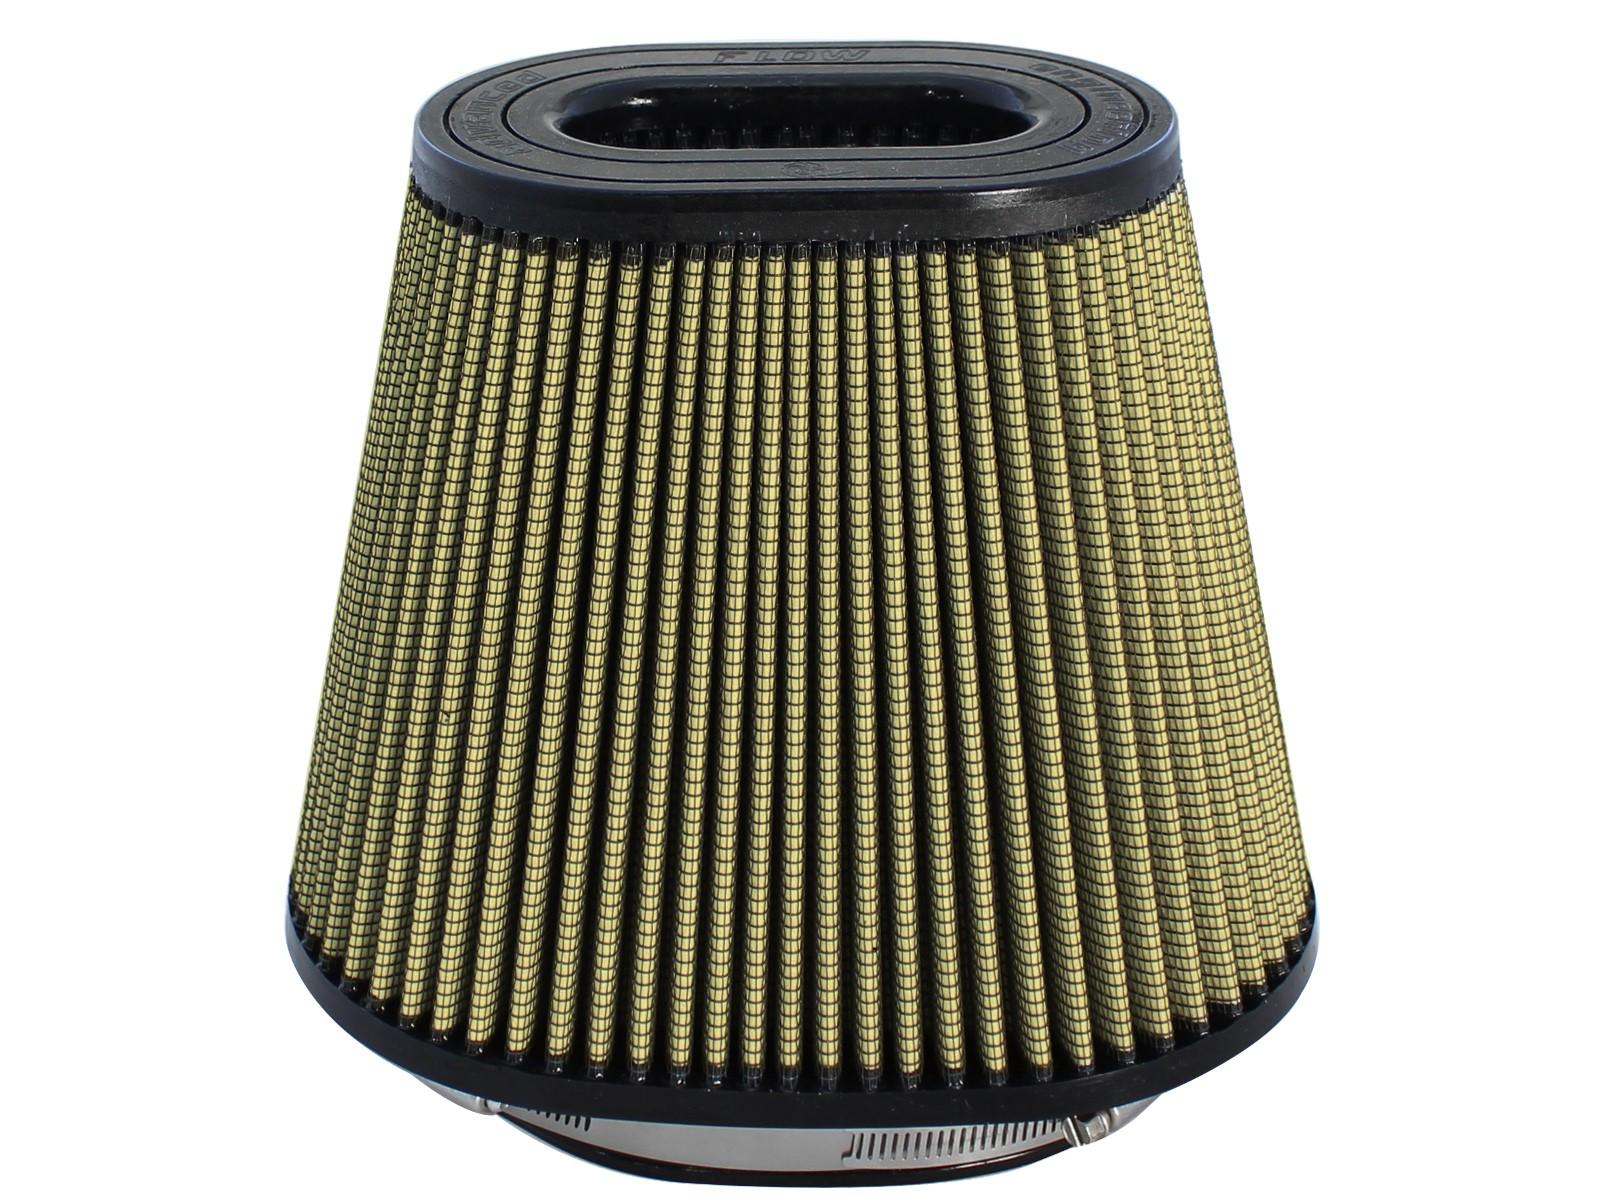 aFe POWER 72-91070 Magnum FLOW Pro GUARD7 Air Filter